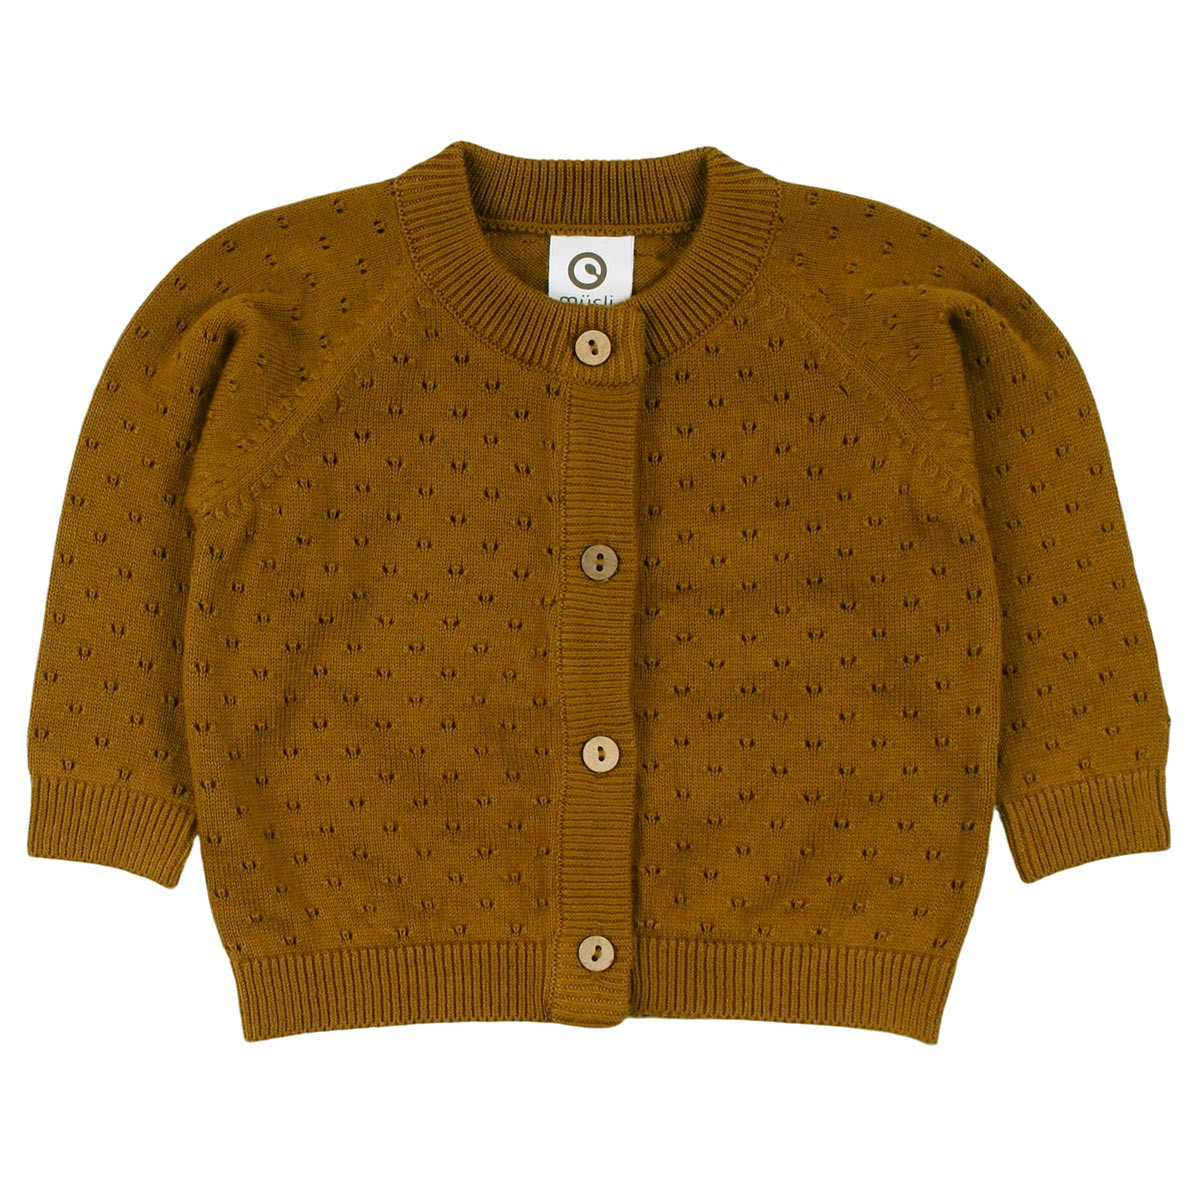 Müsli Knit cardigan – Pesto